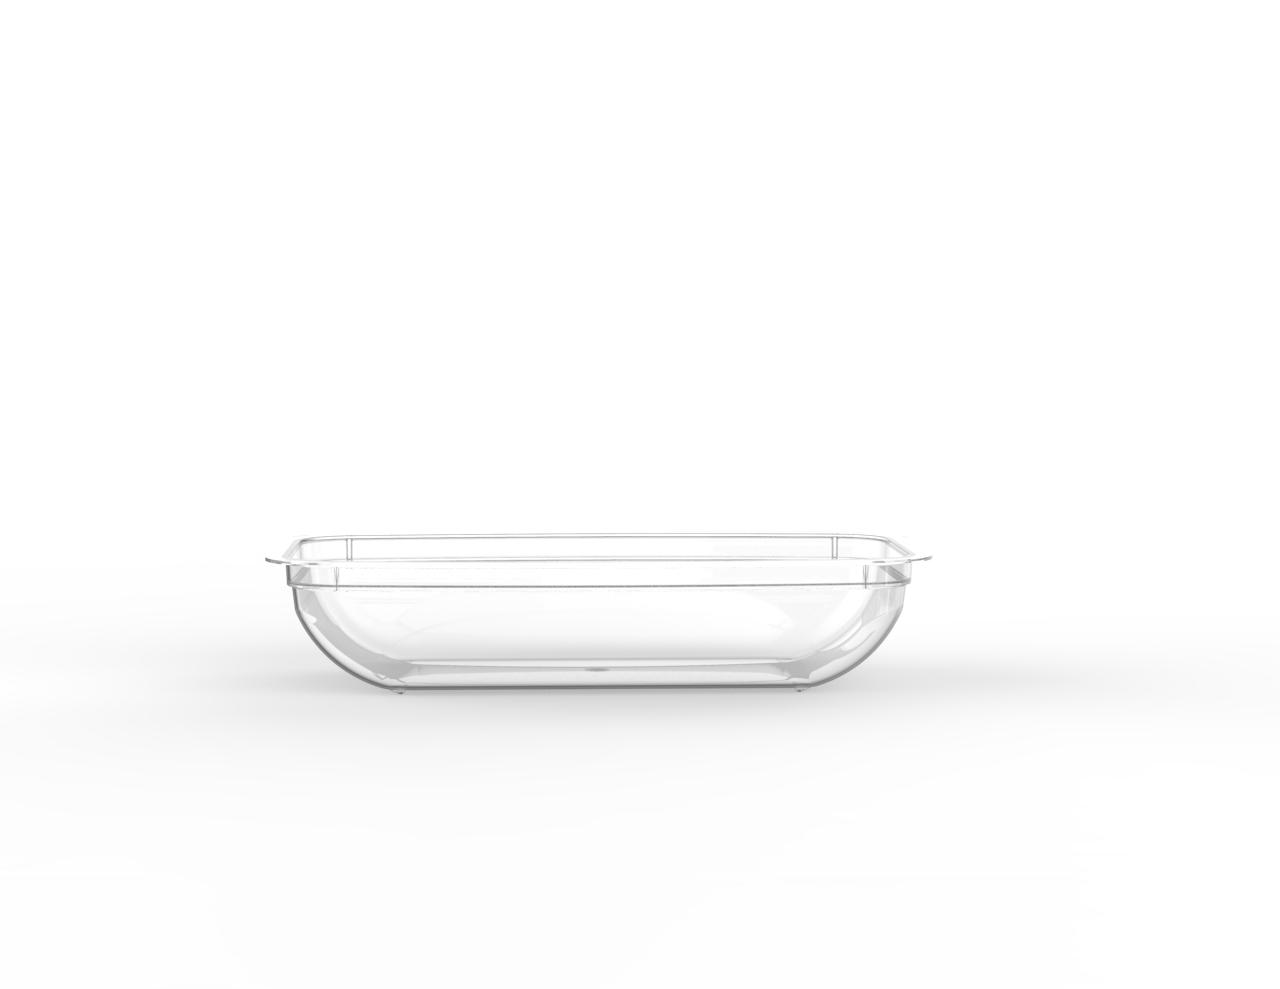 Barquette tartinable operculable transparente 160 cm3